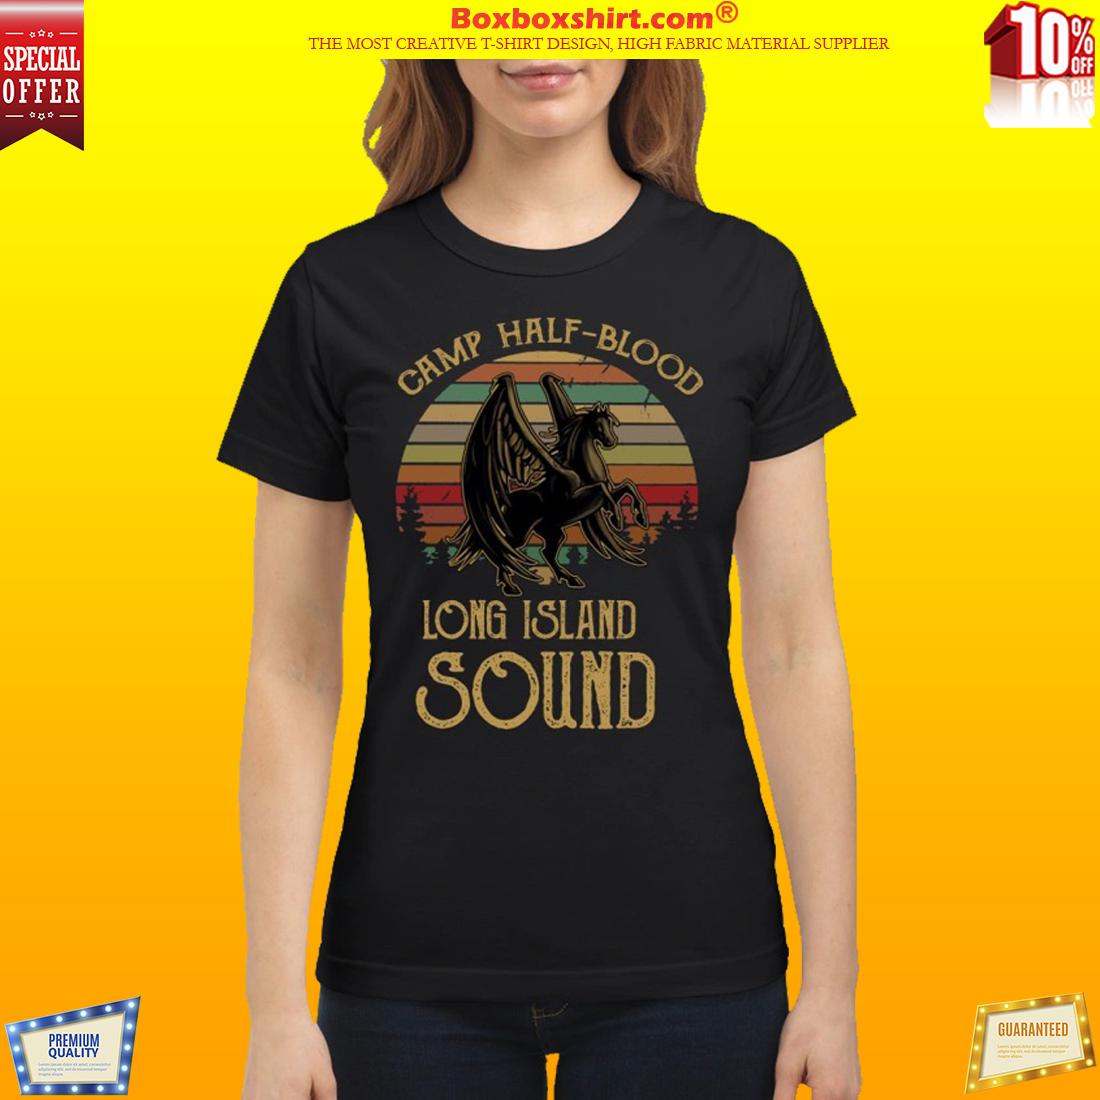 Horse Dragon camp half blood long island sound classic shirt